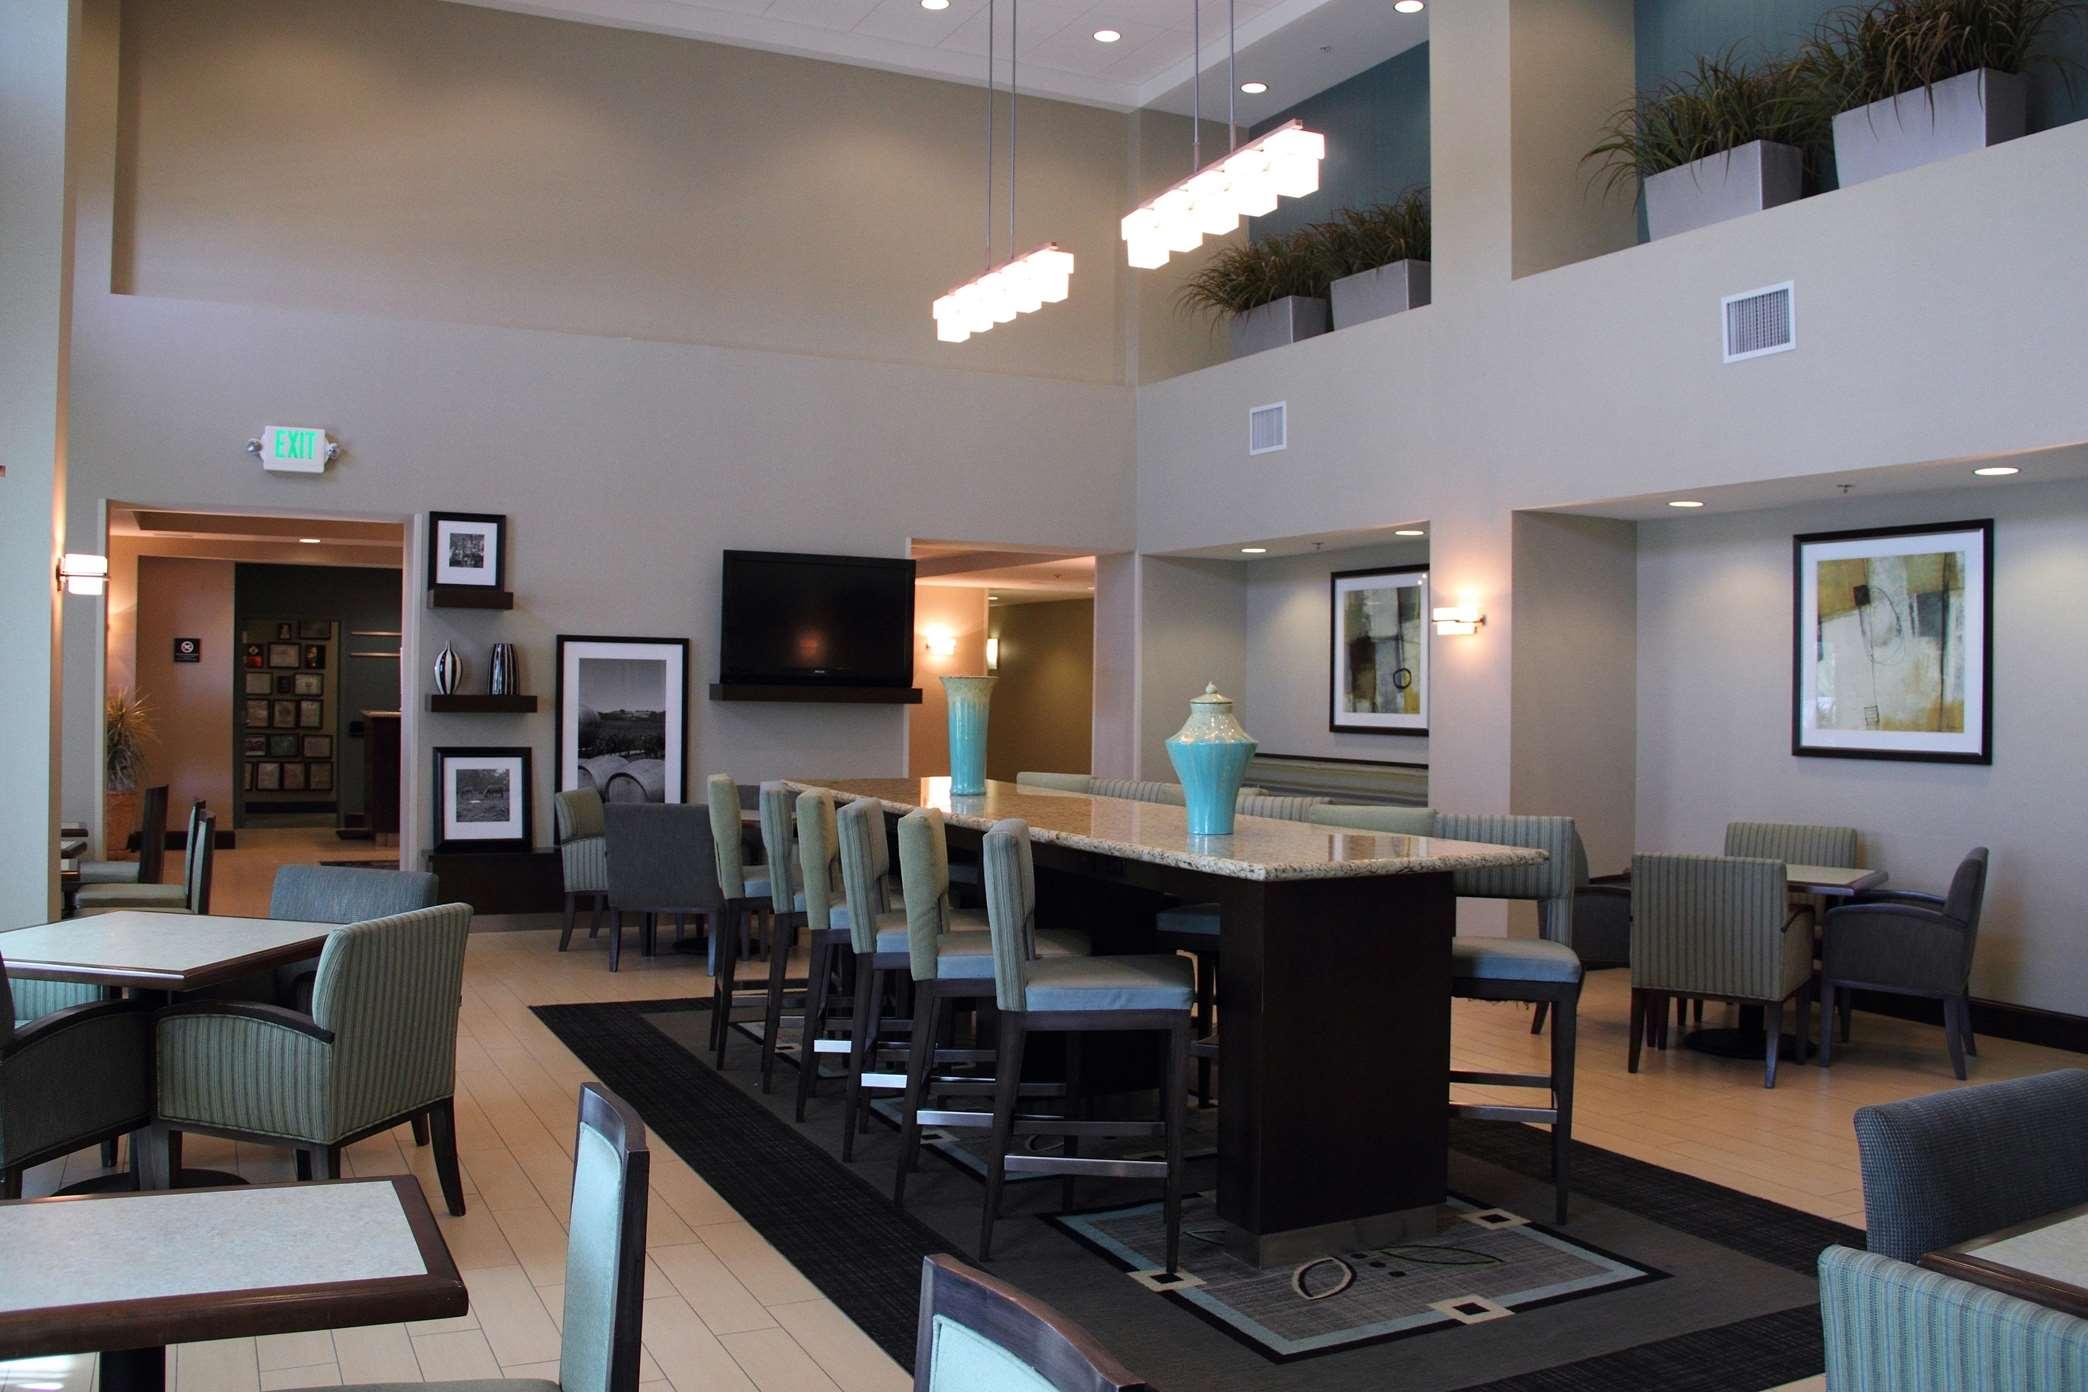 Hampton Inn & Suites Manteca image 28